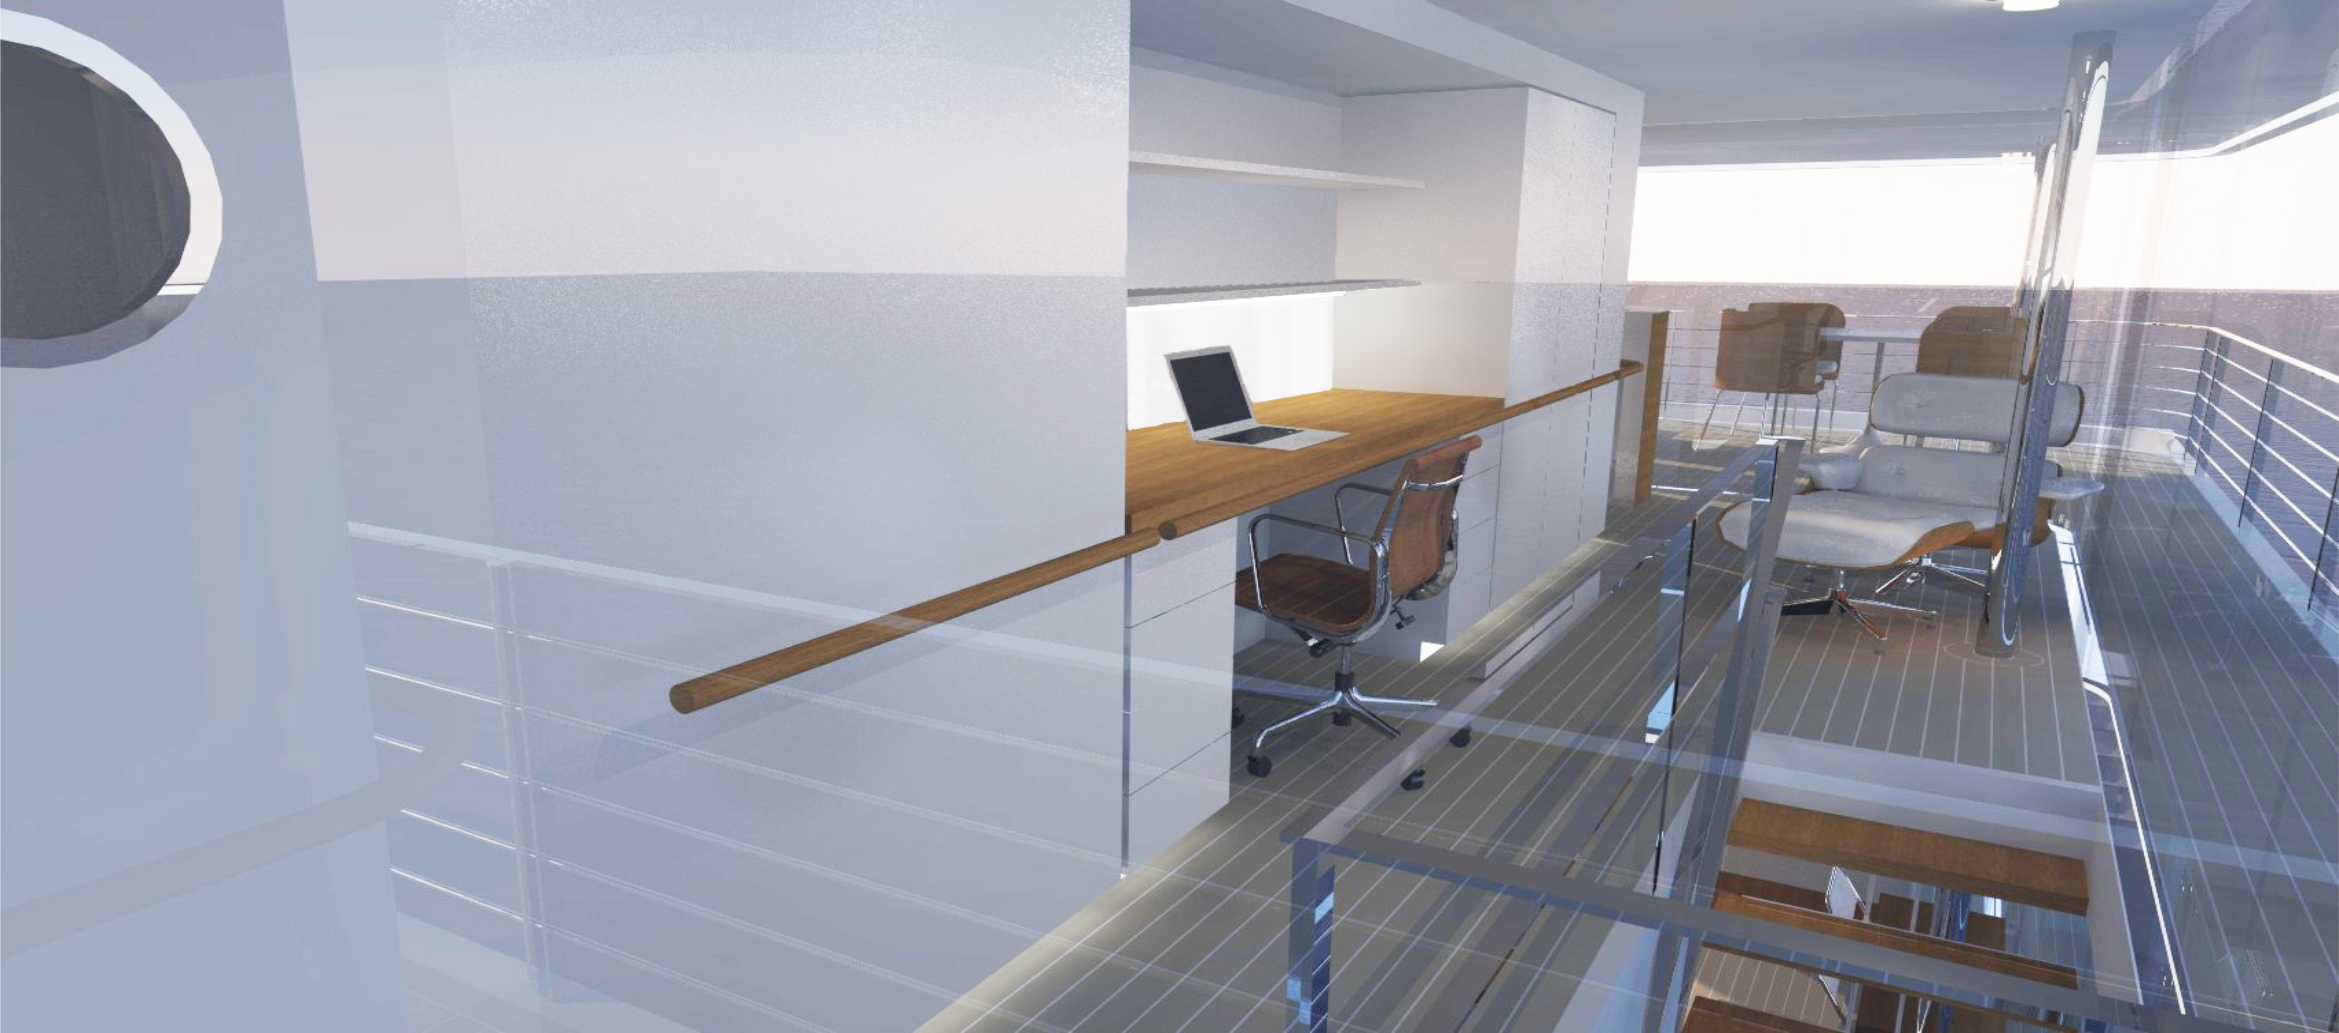 Riverhouse Upper Deck Study